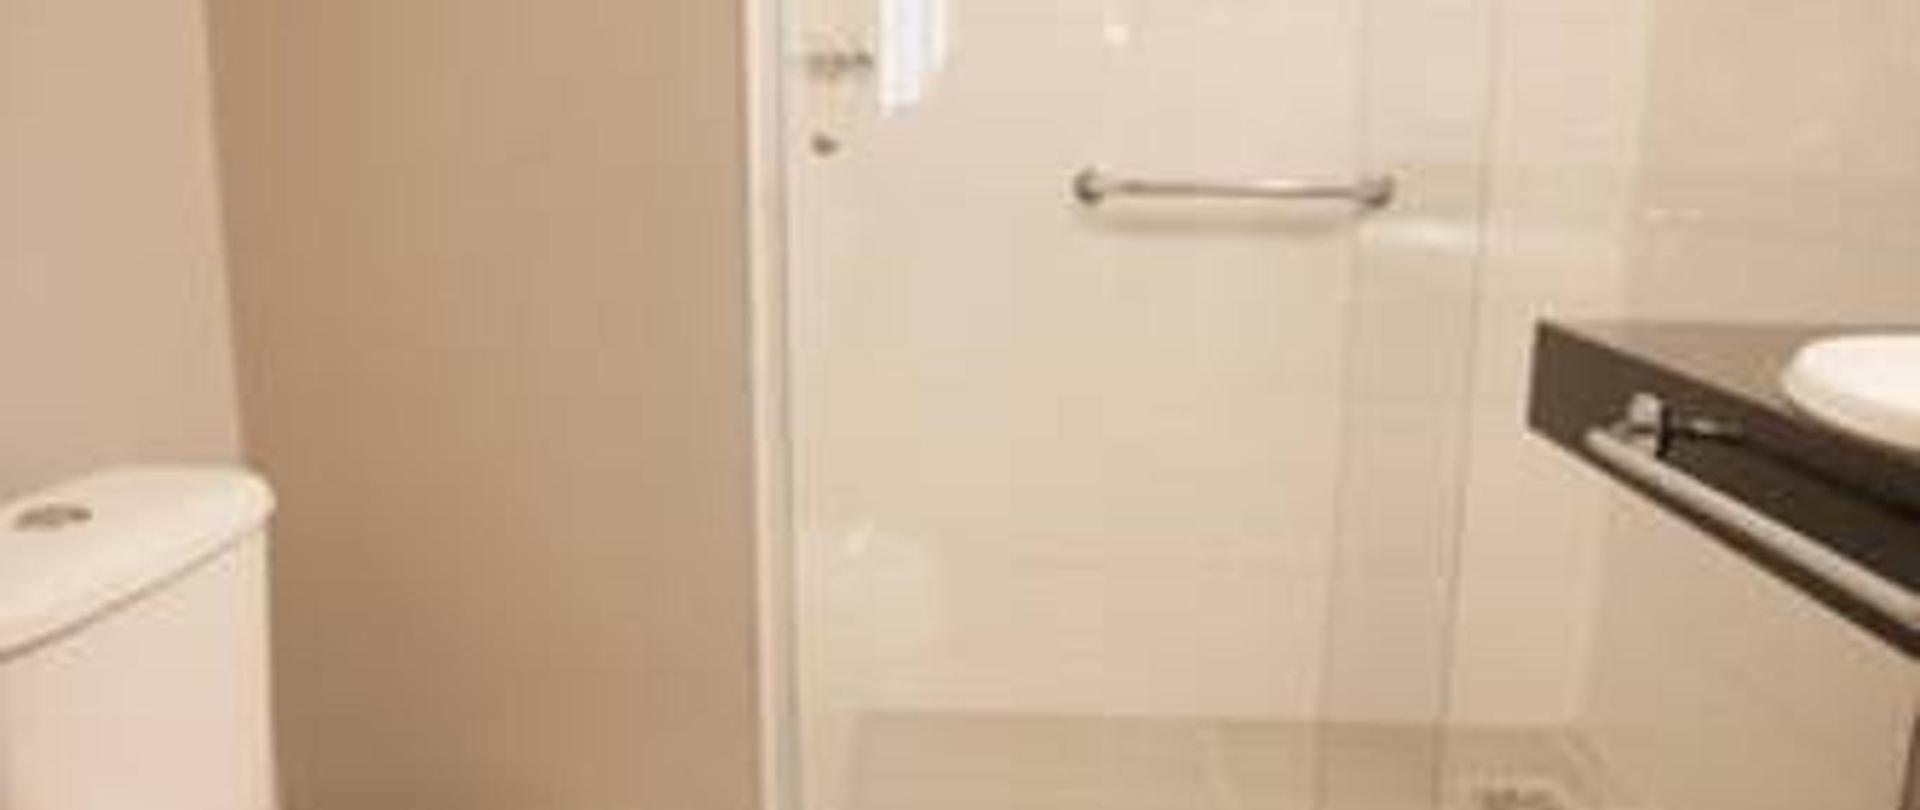 14_Banheiro.jpg